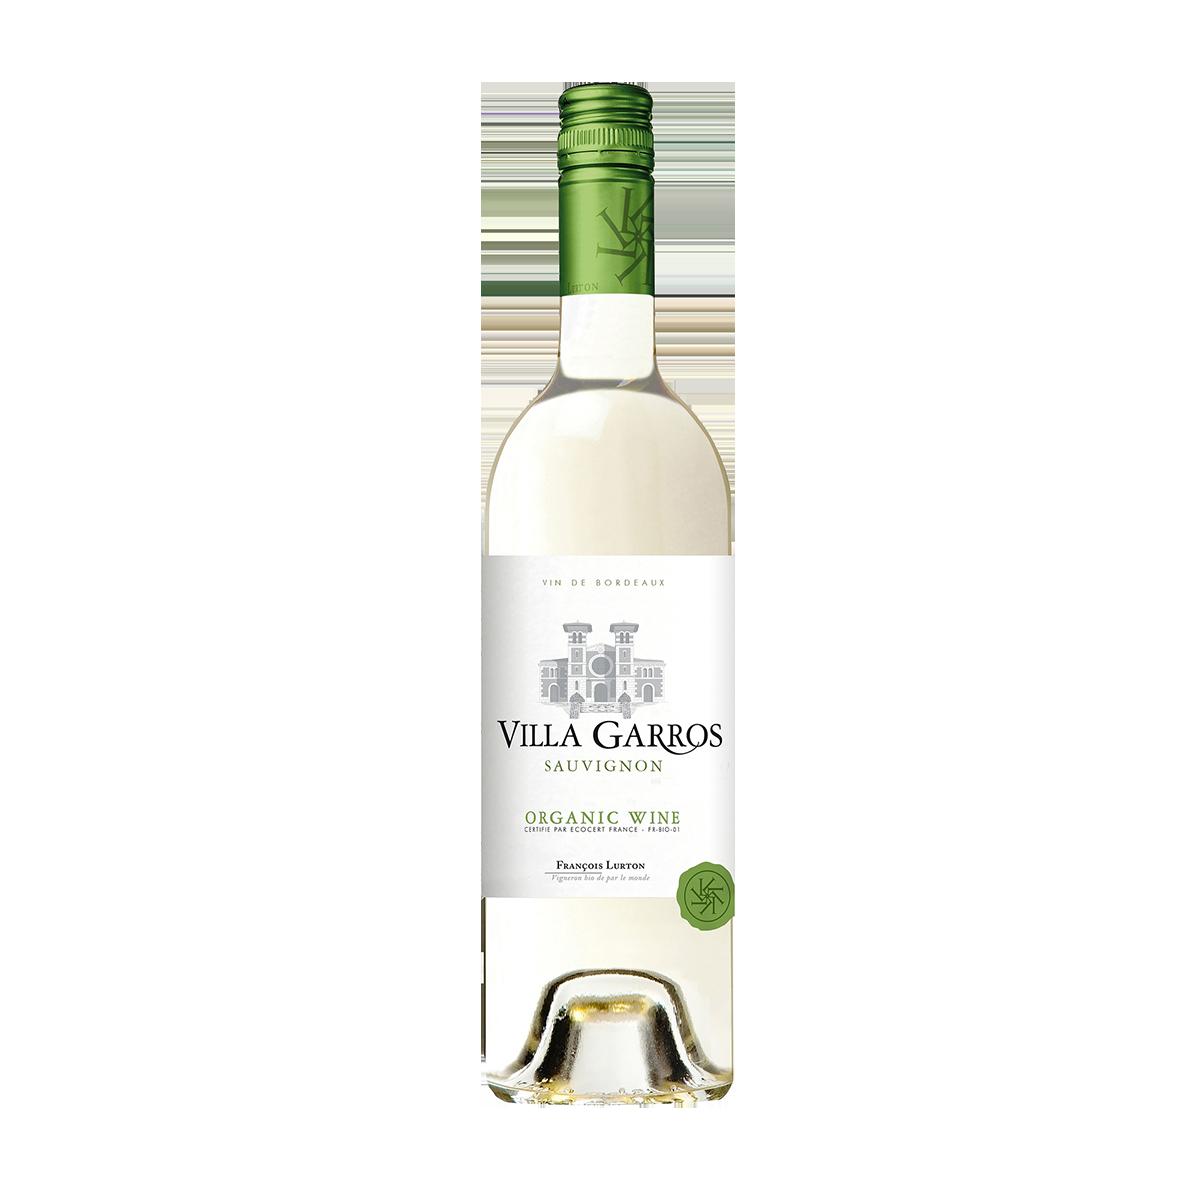 FRL2201-15 法國波爾多路得嘉禾莊園白蘇維濃白葡萄酒 (有機葡萄酒) Villa Garros Sauvignon Bordeaux A.O.P. (Organic Wine)